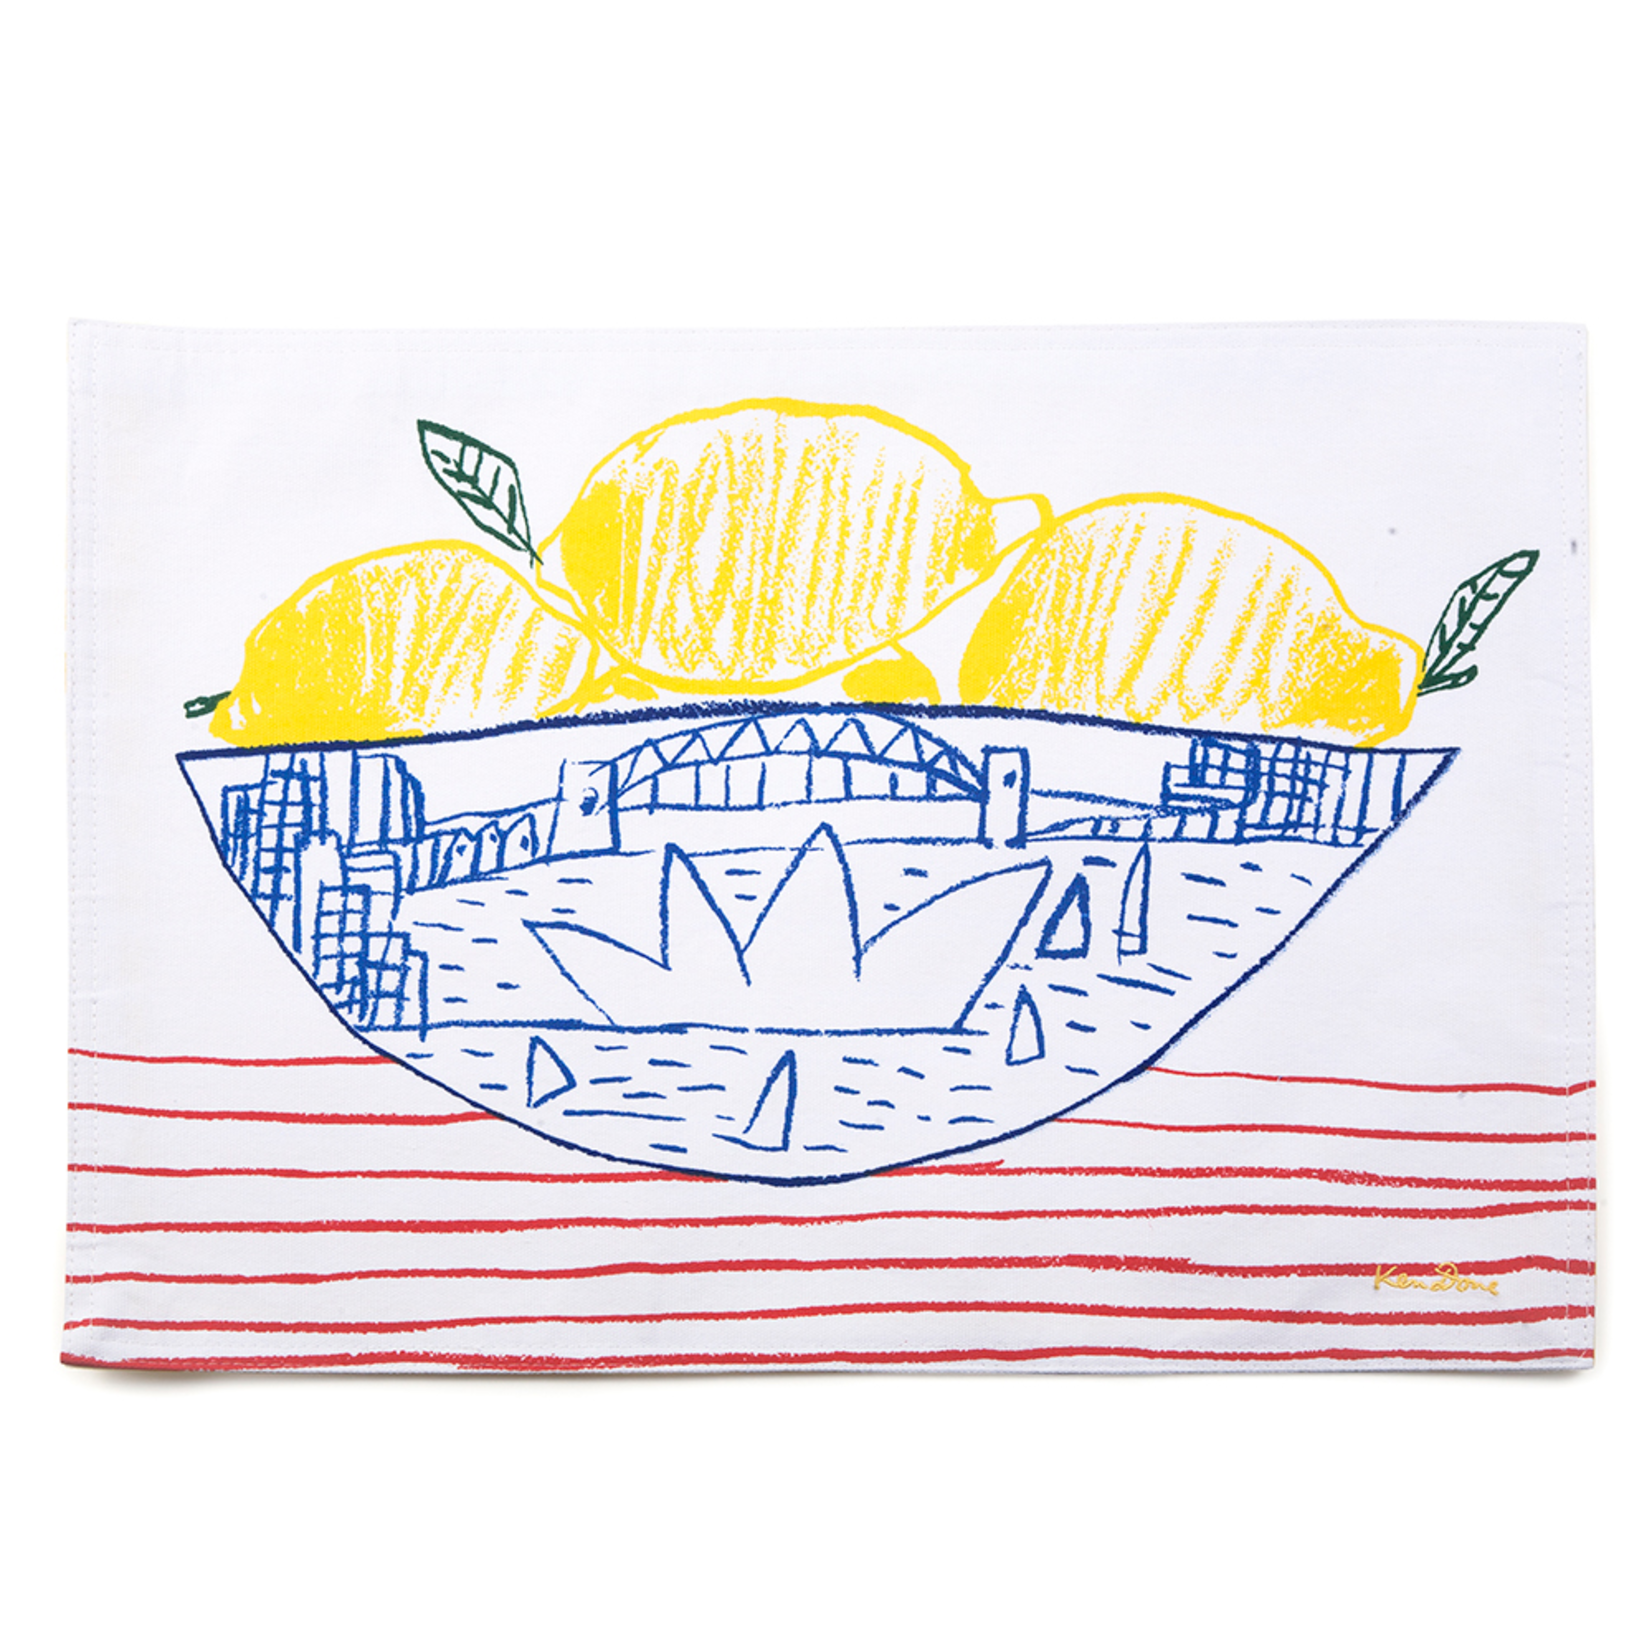 Homewares Placemats set of 2 - Sydney Bowl of Lemons